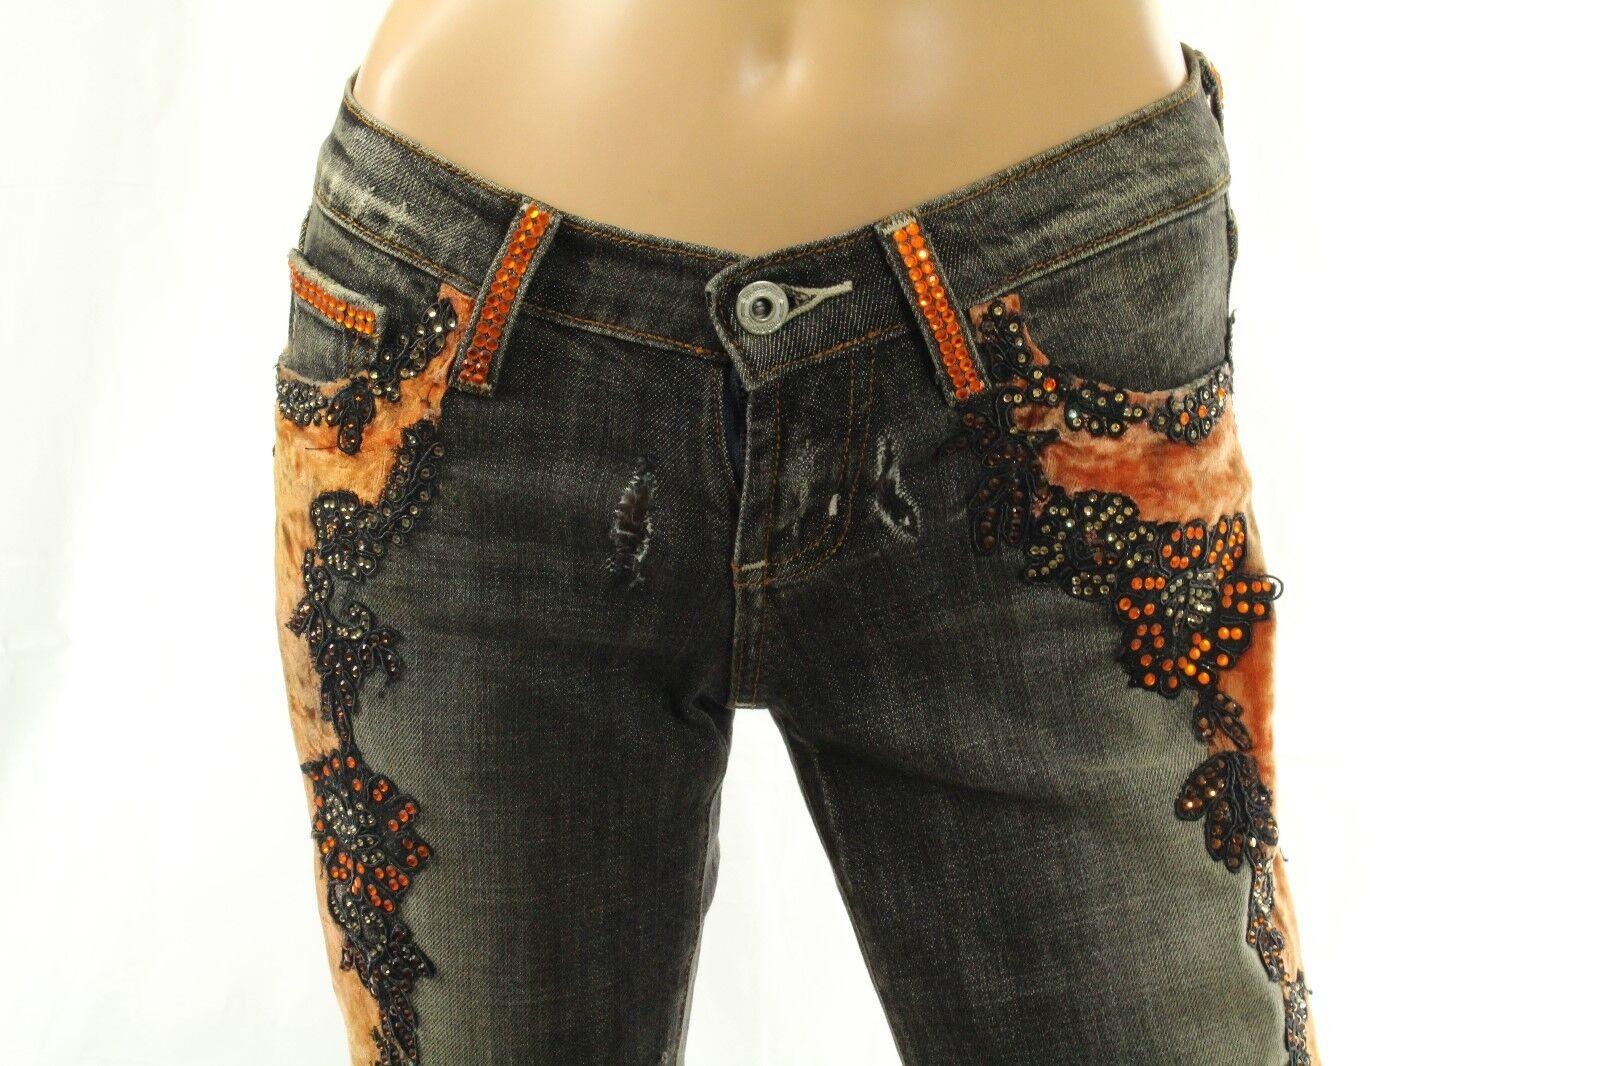 Claudio Milano Women's Jeans Swarovski Crystal Lace Embellished Size 26     1200